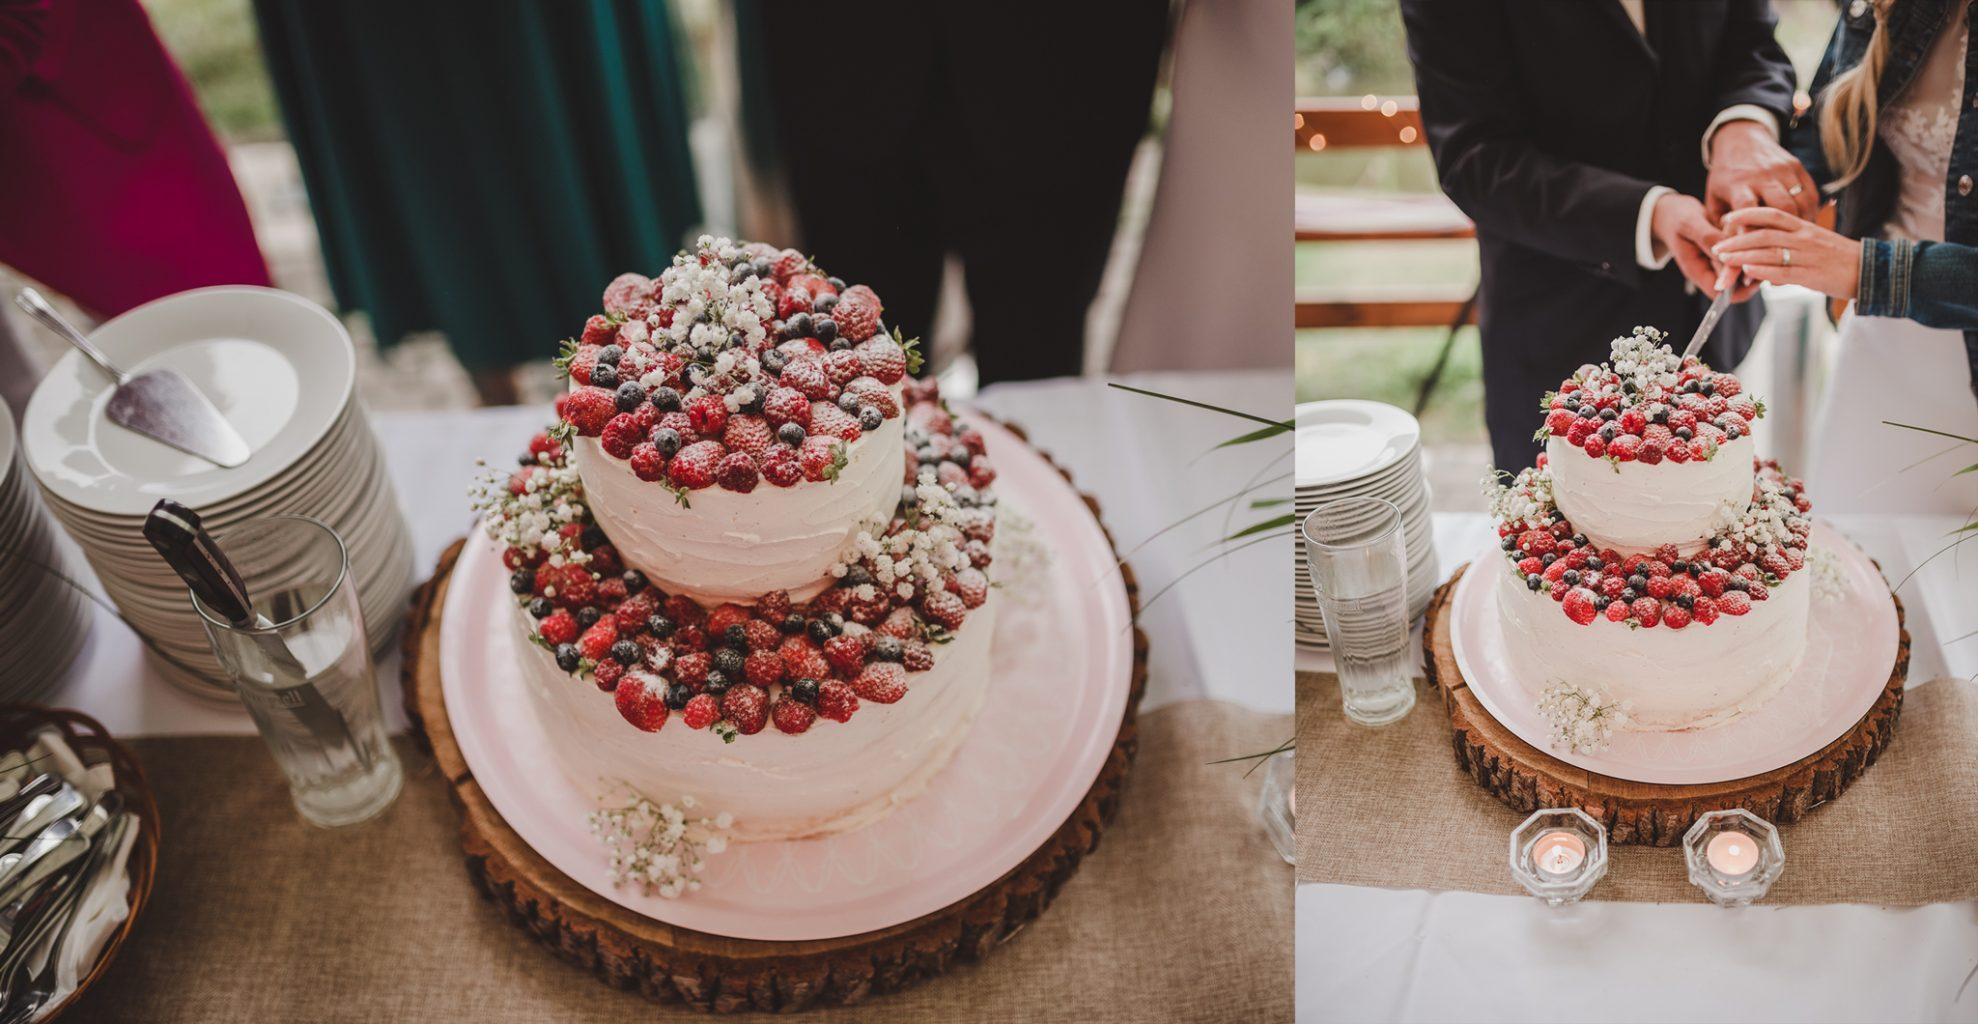 svatebni dort naked krajeni svatebniho dortu